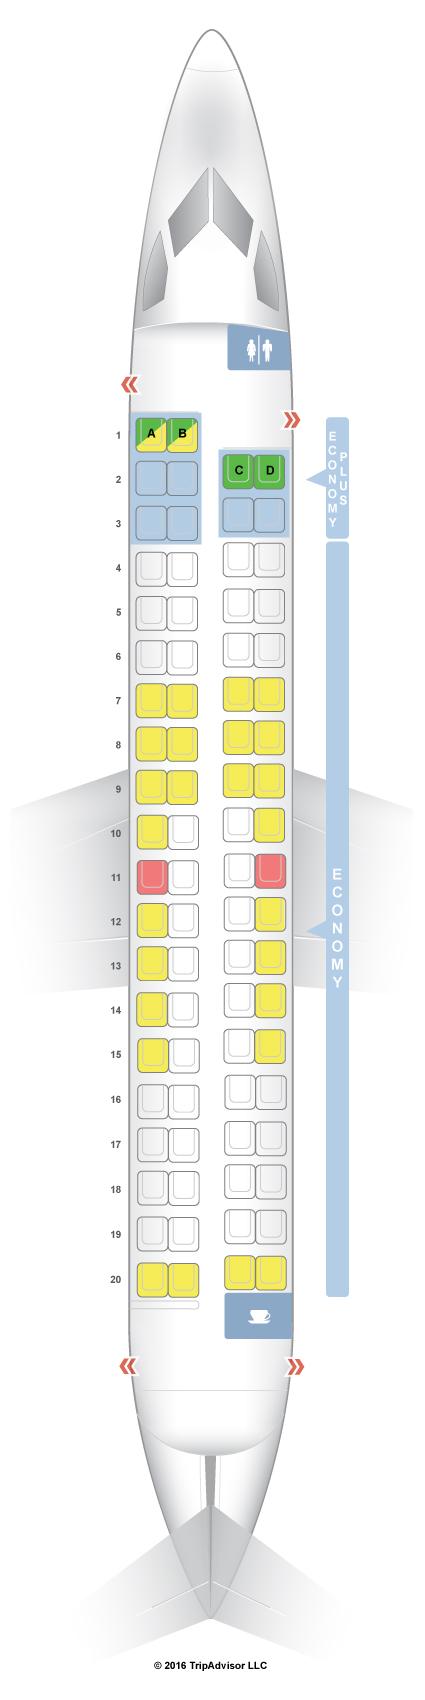 Seatguru Seat Map Westjet Bombardier Q400